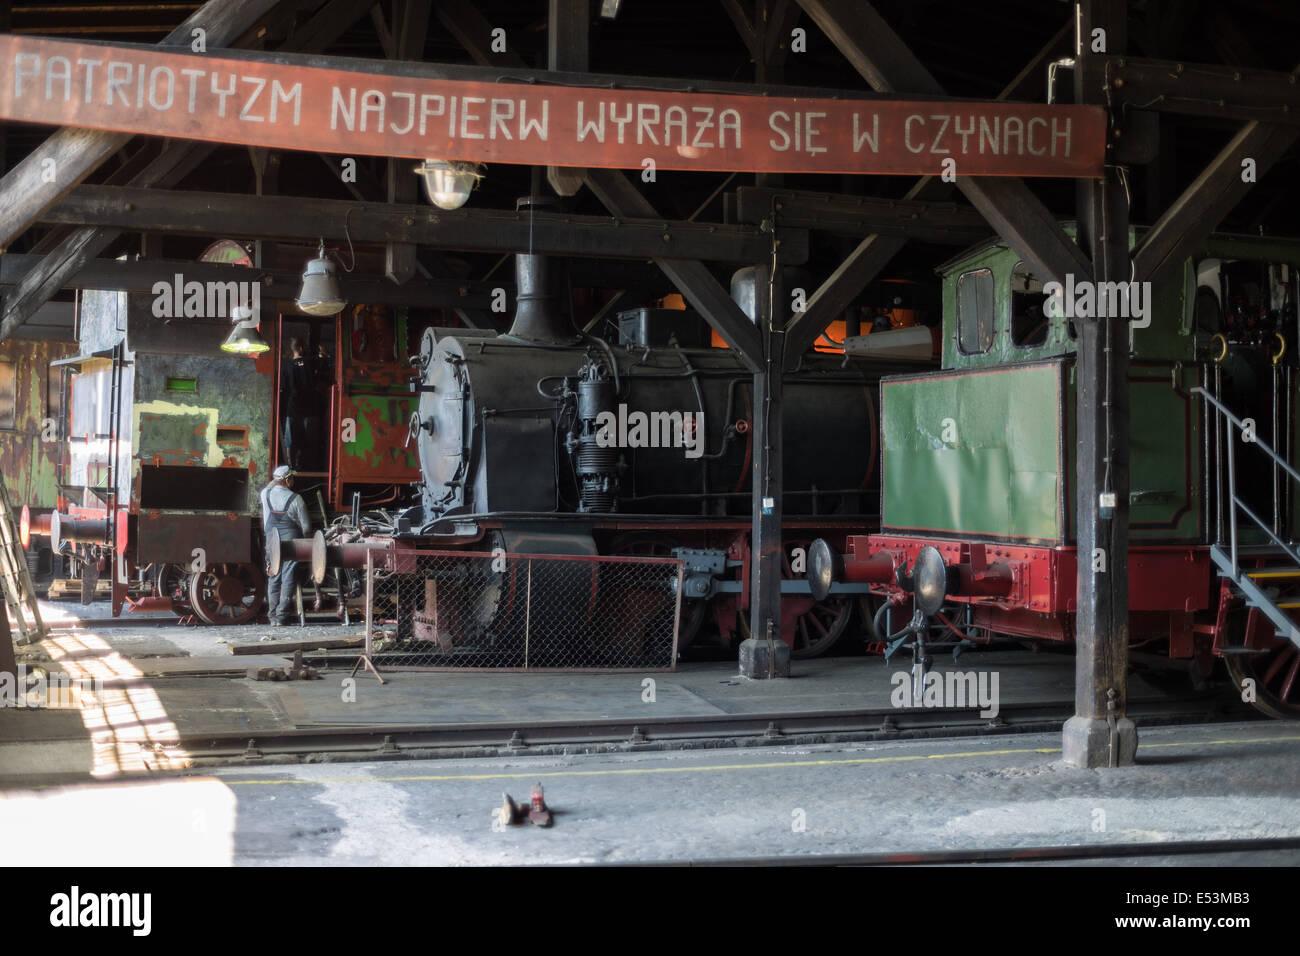 Old steam locomotives Jaworzyna Slaska depot - Stock Image